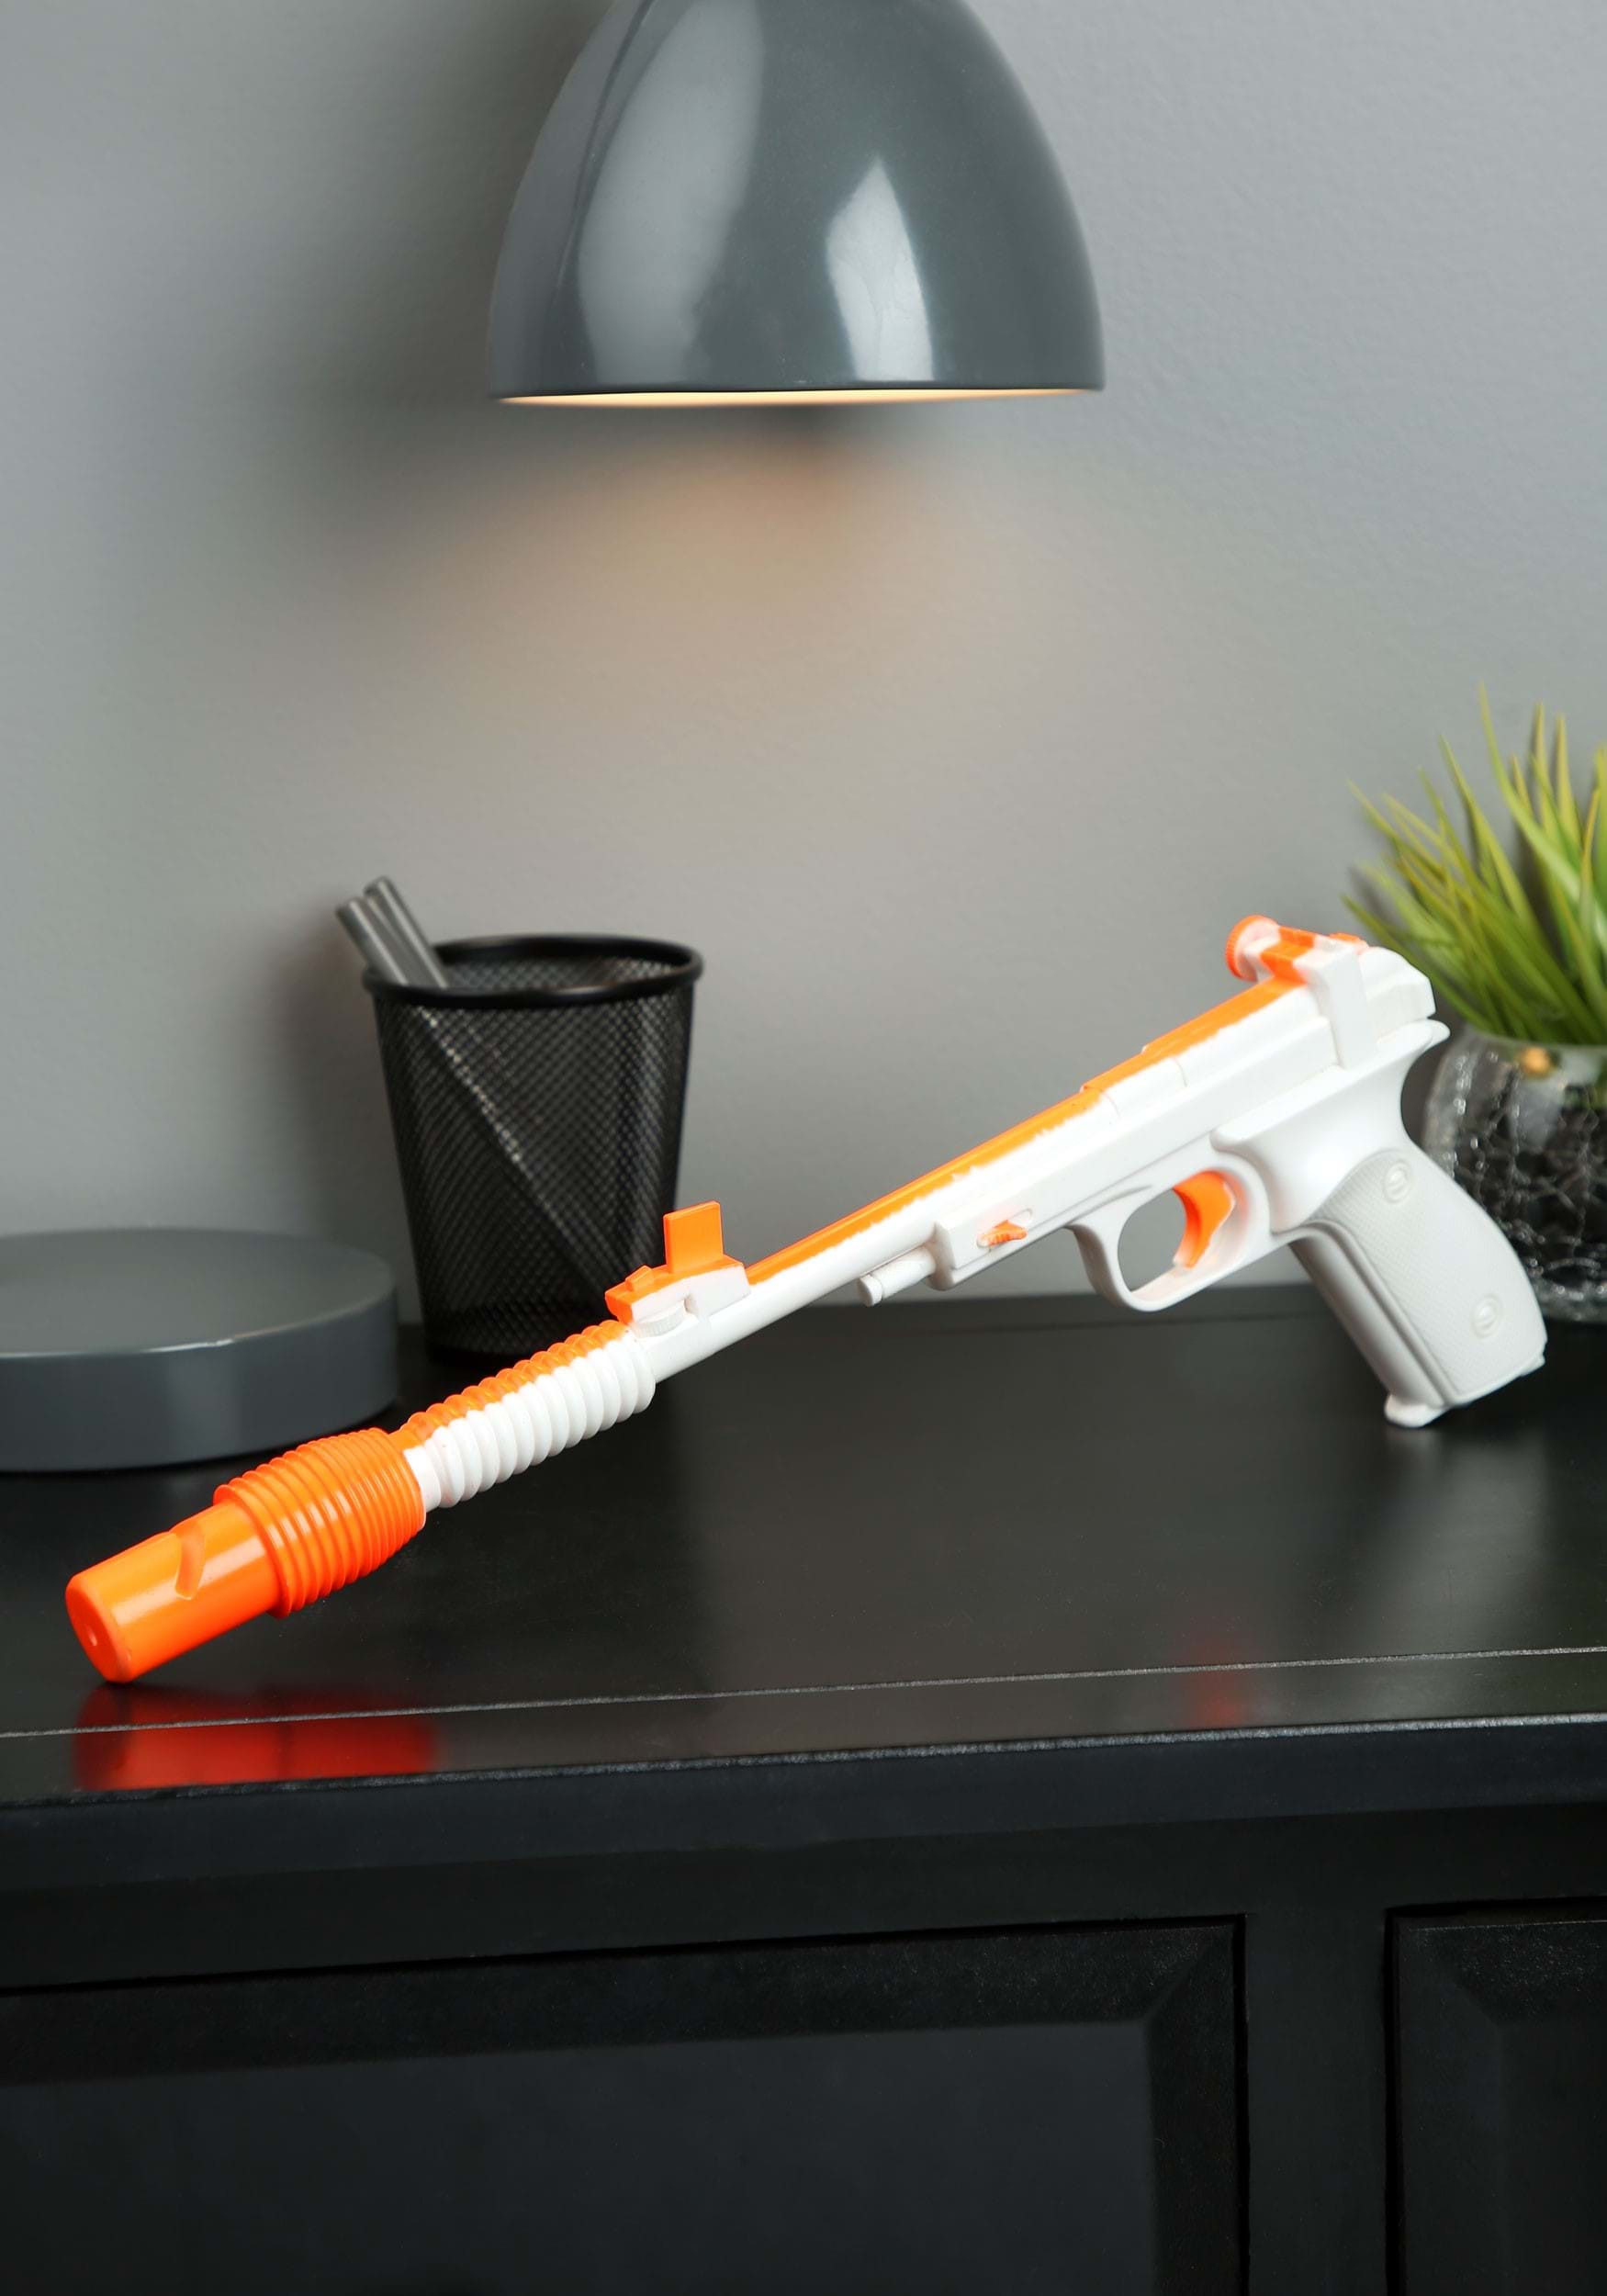 Princess Leia Blaster From Star Wars